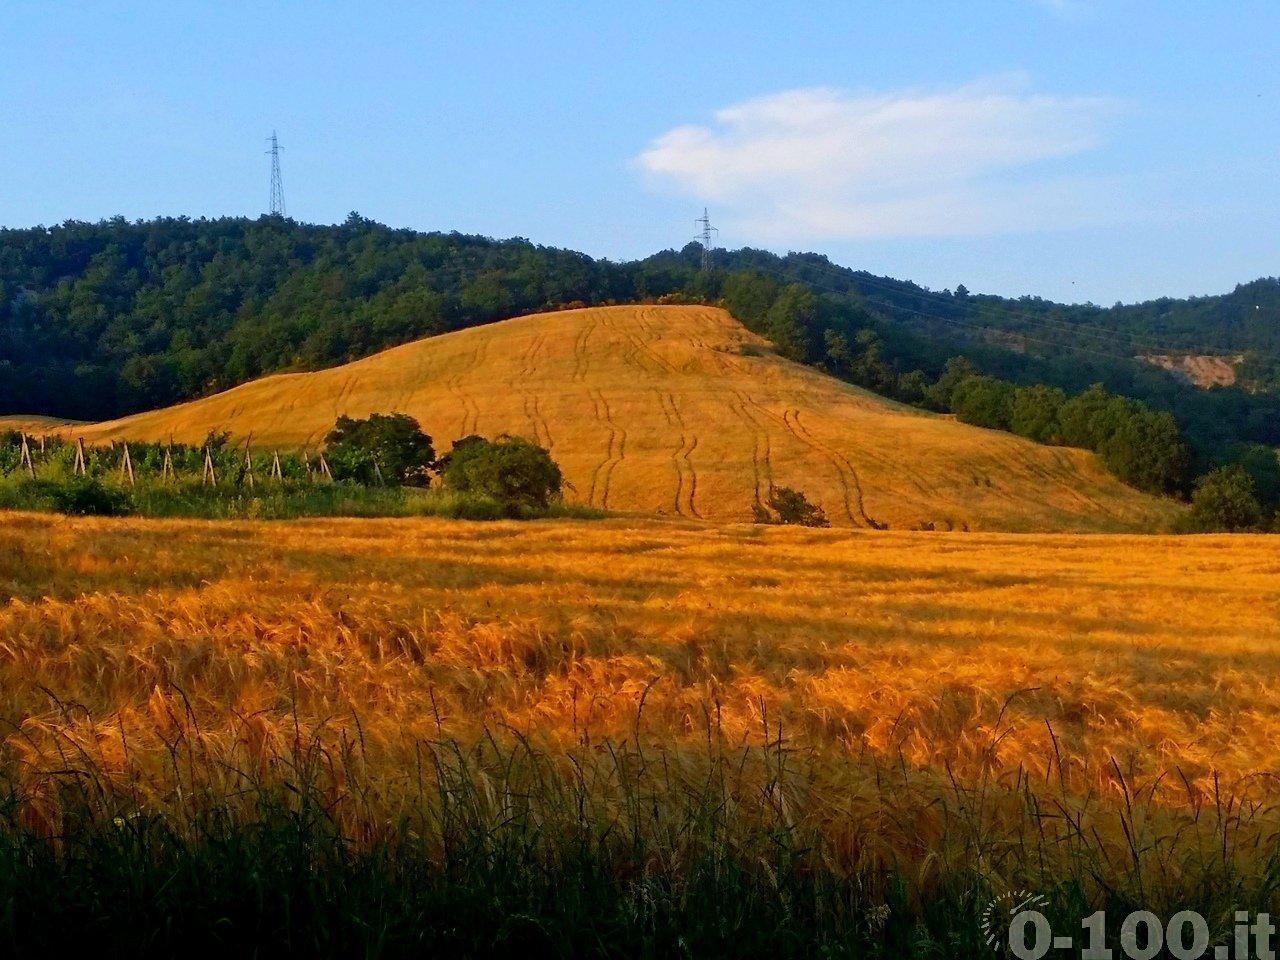 santa-felicita-paterna-turismo-umbria-agriturismo-vacanza-country-house-0-100__34